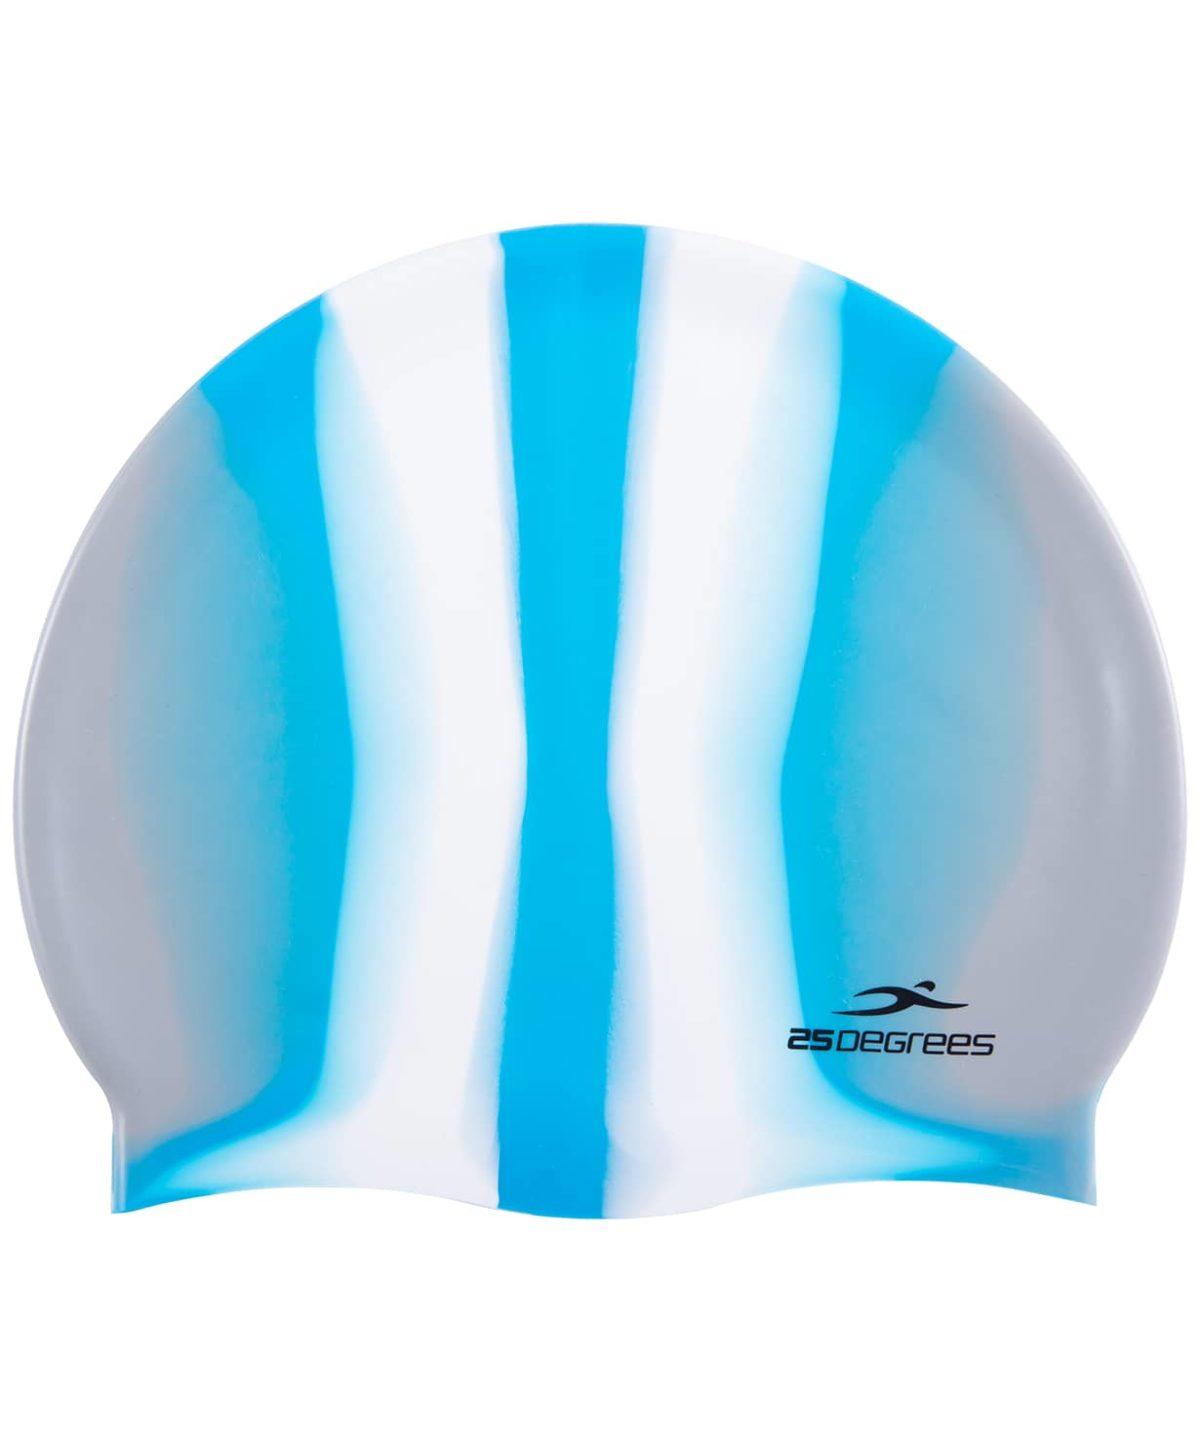 25DEGREES Шапочка для плавания Grade, силикон 25D15-GR01-20-30 - 1